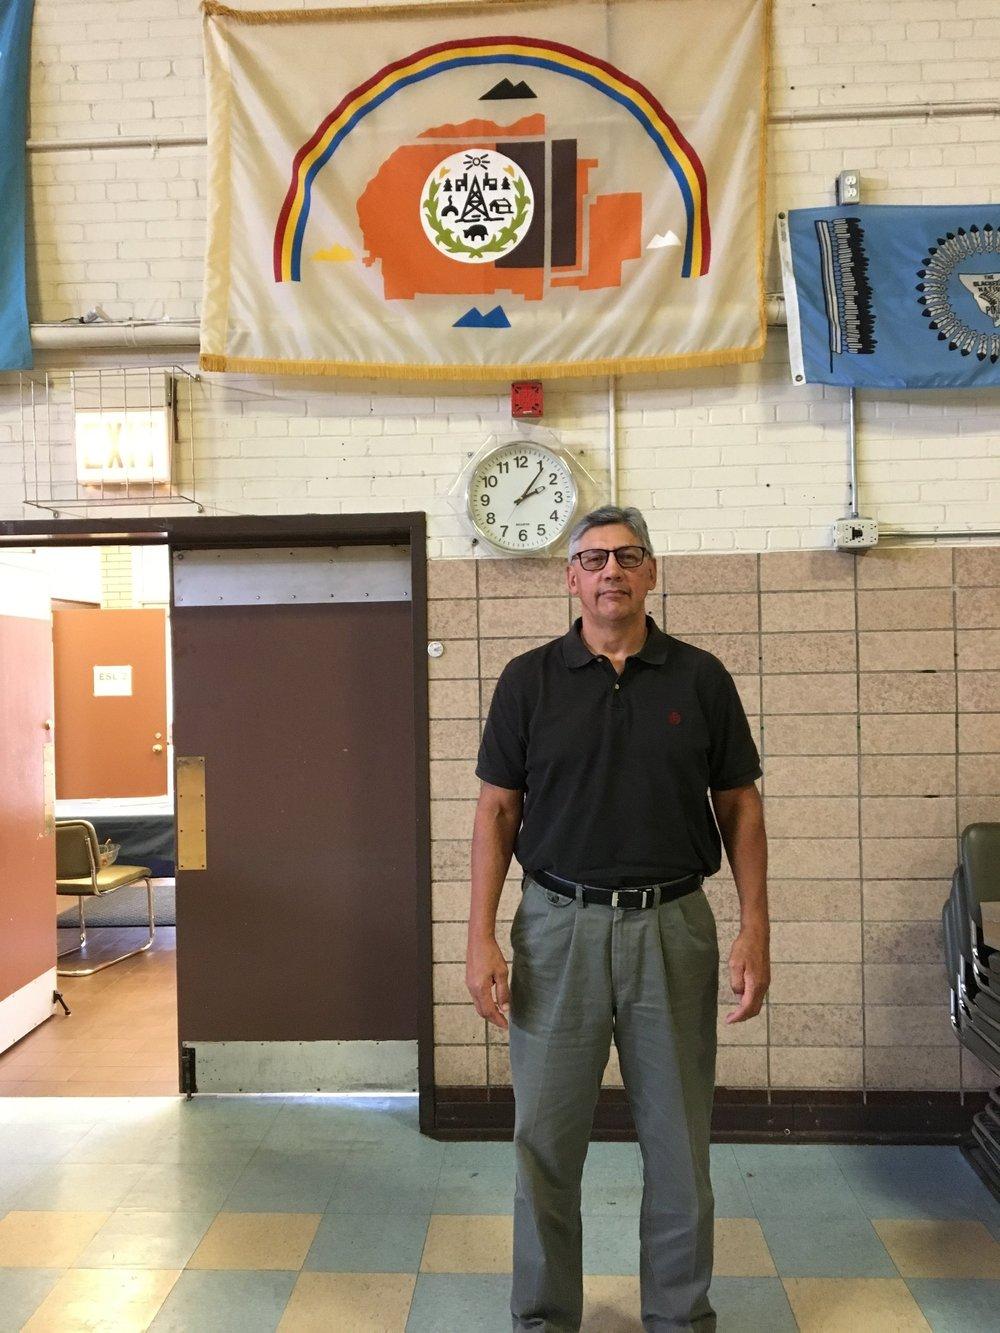 Les Begay beneath the Diné (Navajo) flag